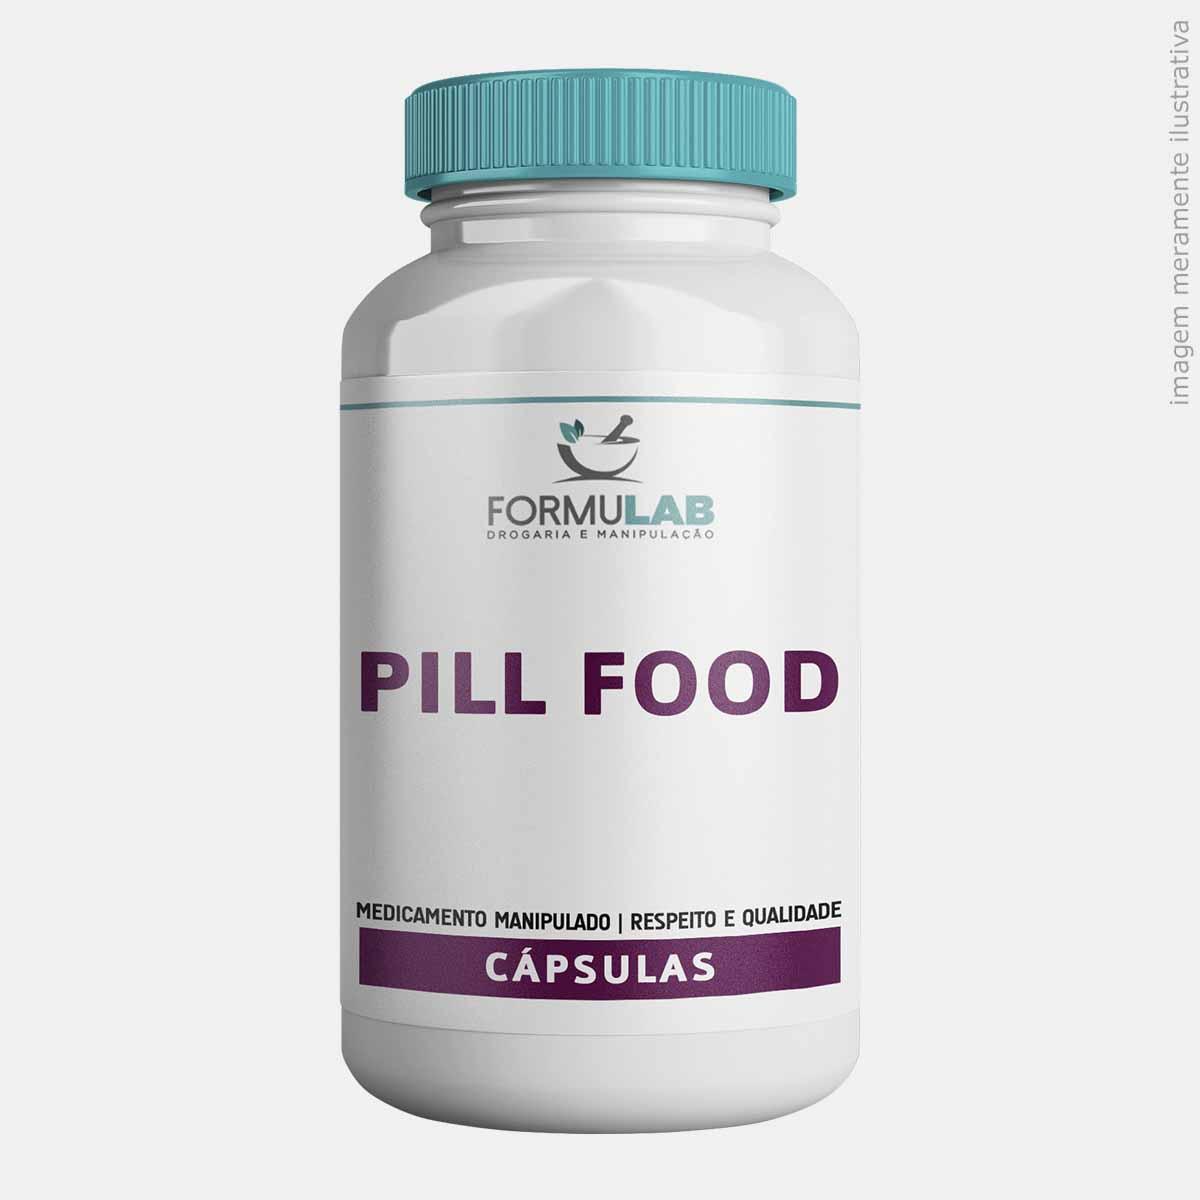 Pill Food - Biotina + Cisteína + Cistina + Colágeno + Metionina + Pantotenato de Cálcio + Vitamina B2 + Vitamina B6 + Vitamina E